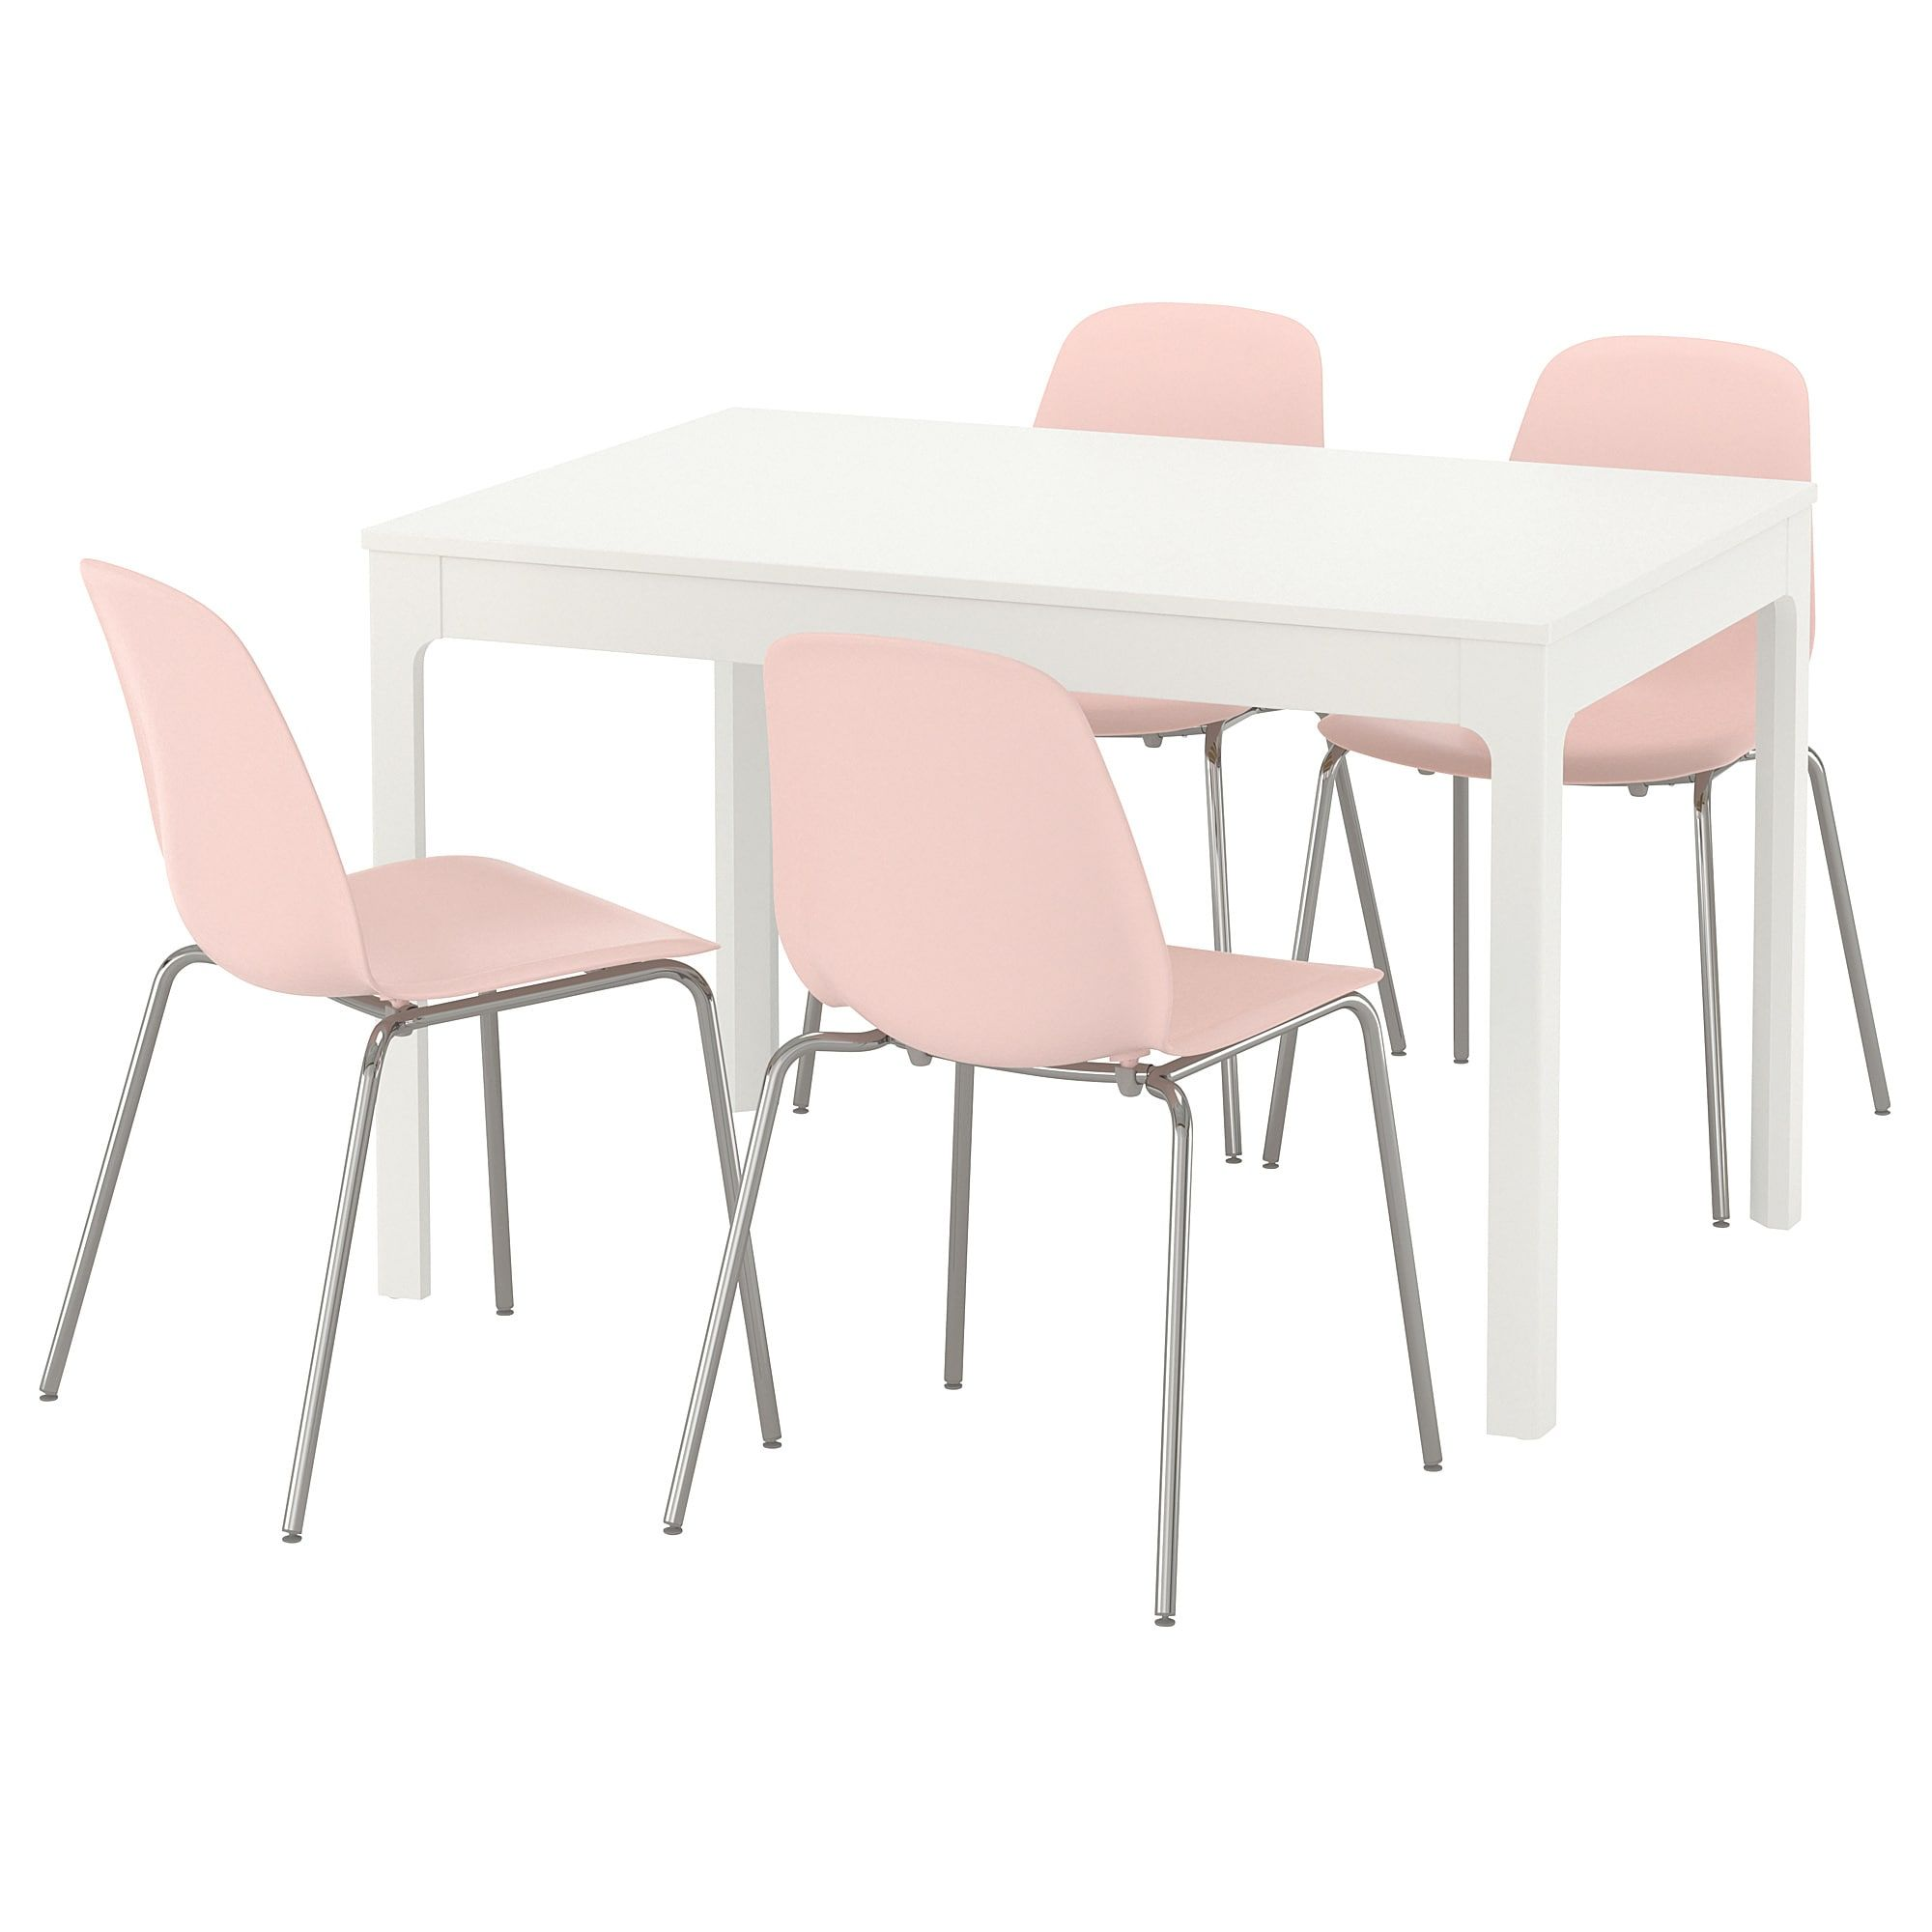 Ikea Dining Room Chairs Brick Wall Decoration Ideas Fur ...